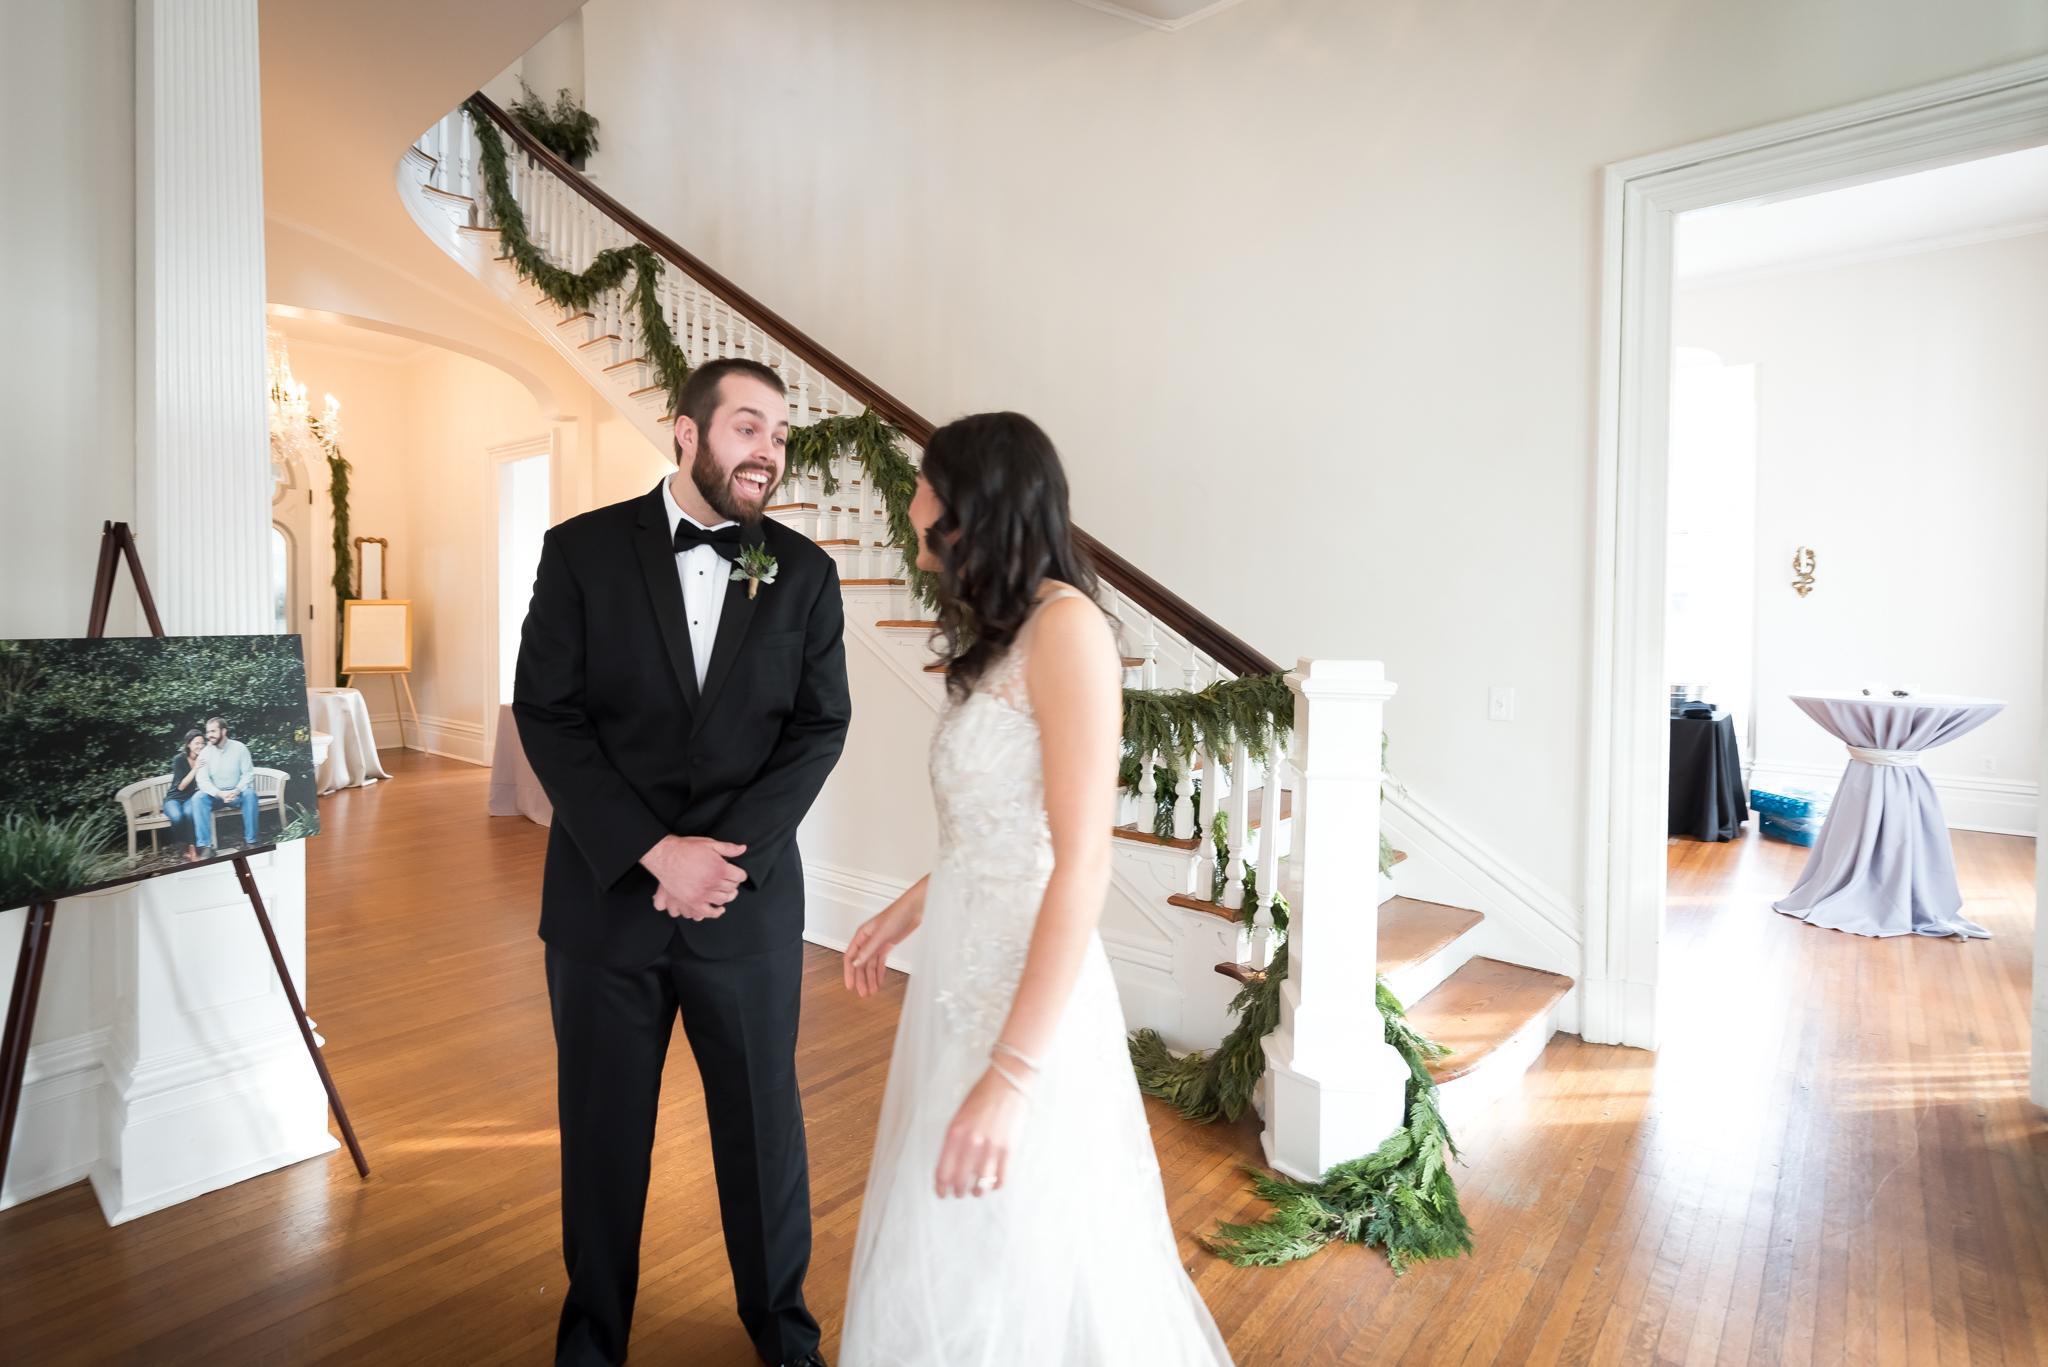 merrimon-wynne-wedding-photography-011.jpg